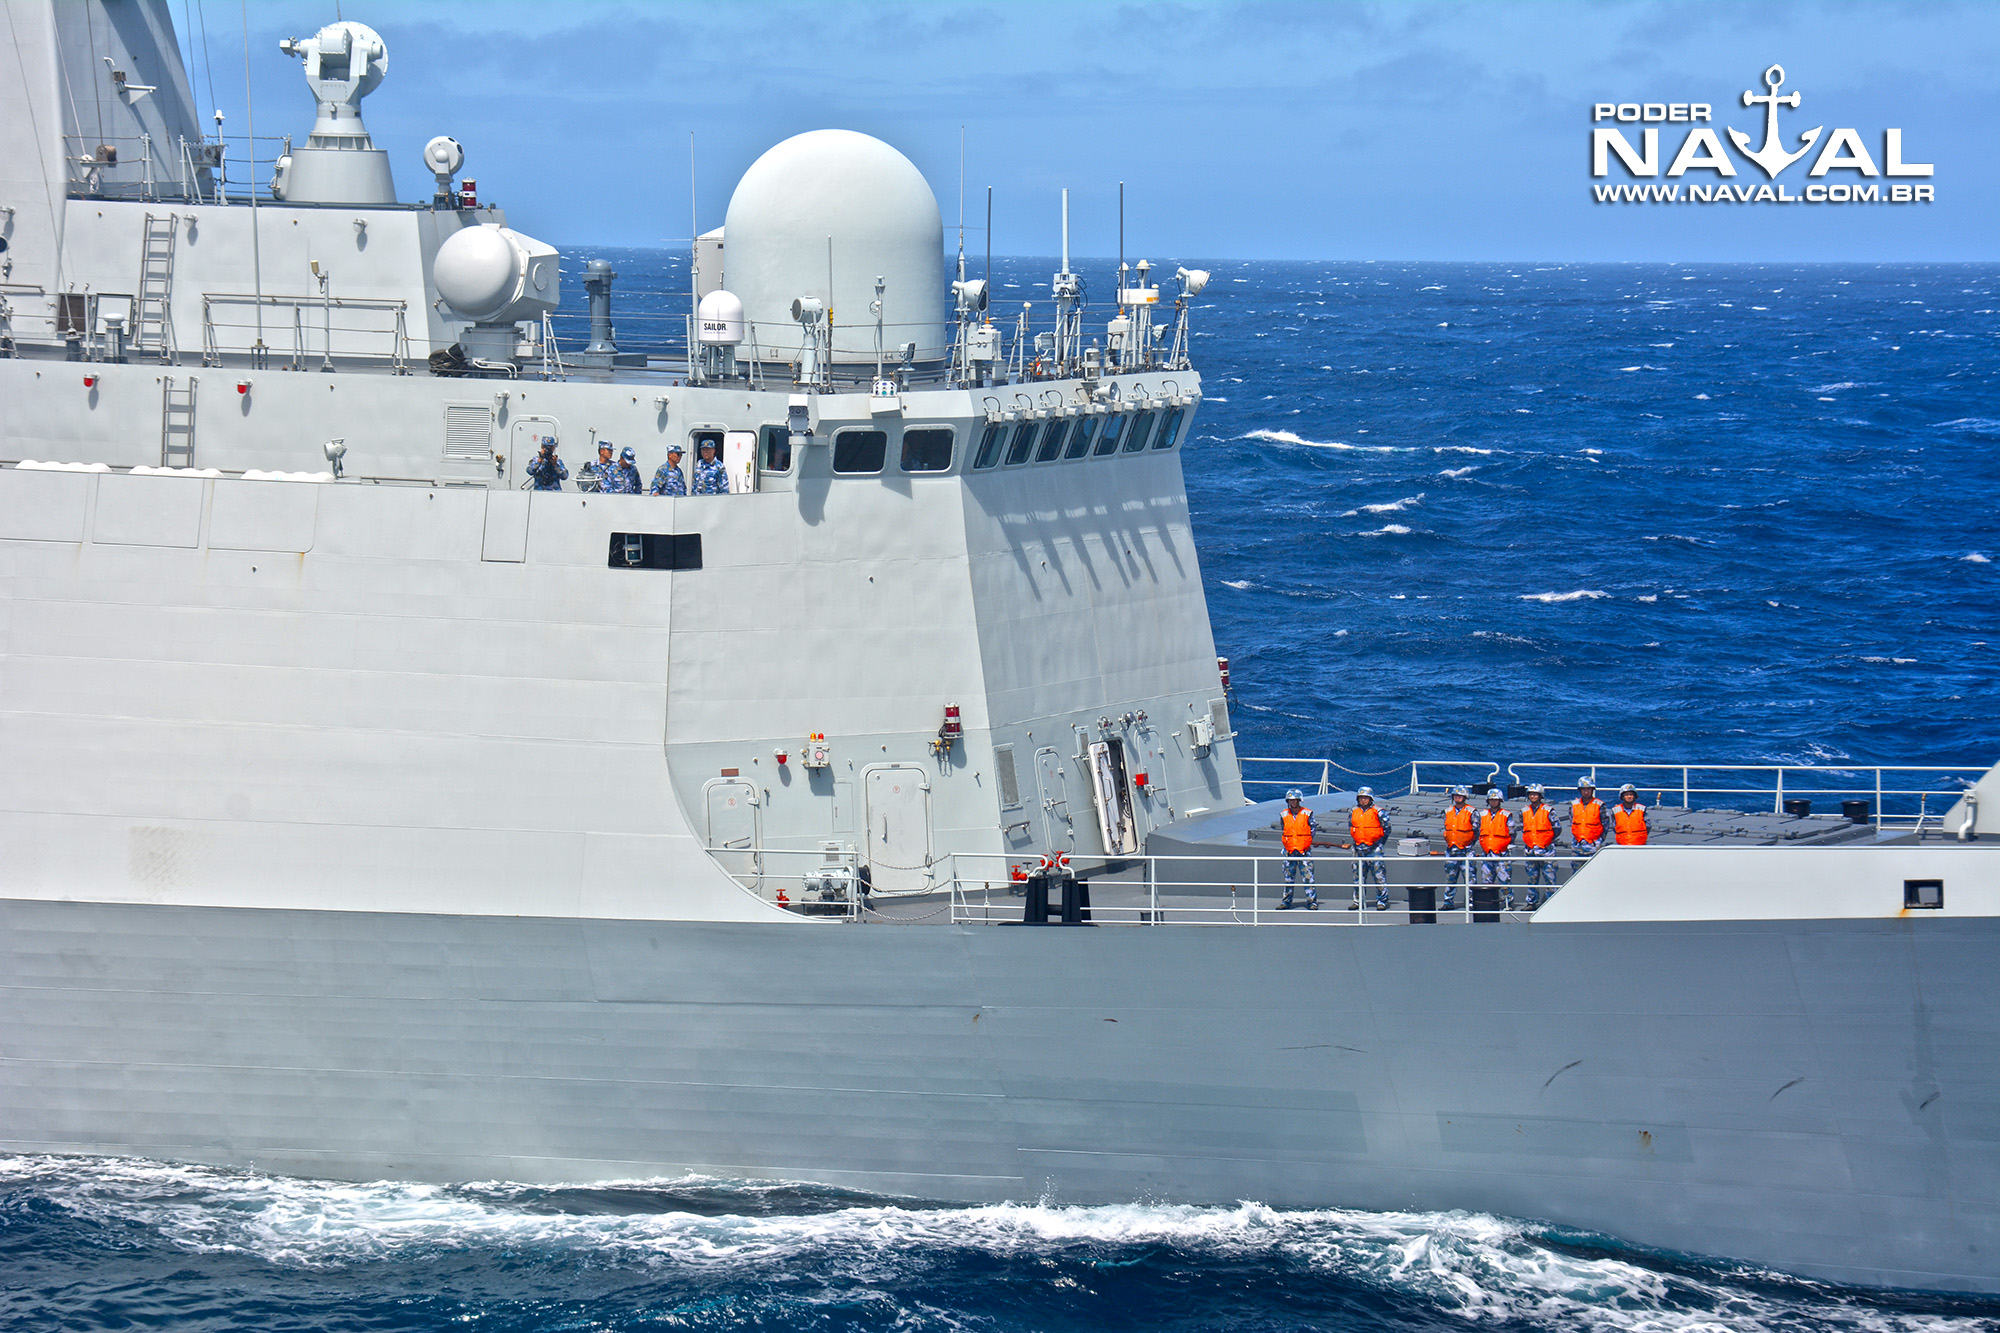 Passex PLA Navy 1010a